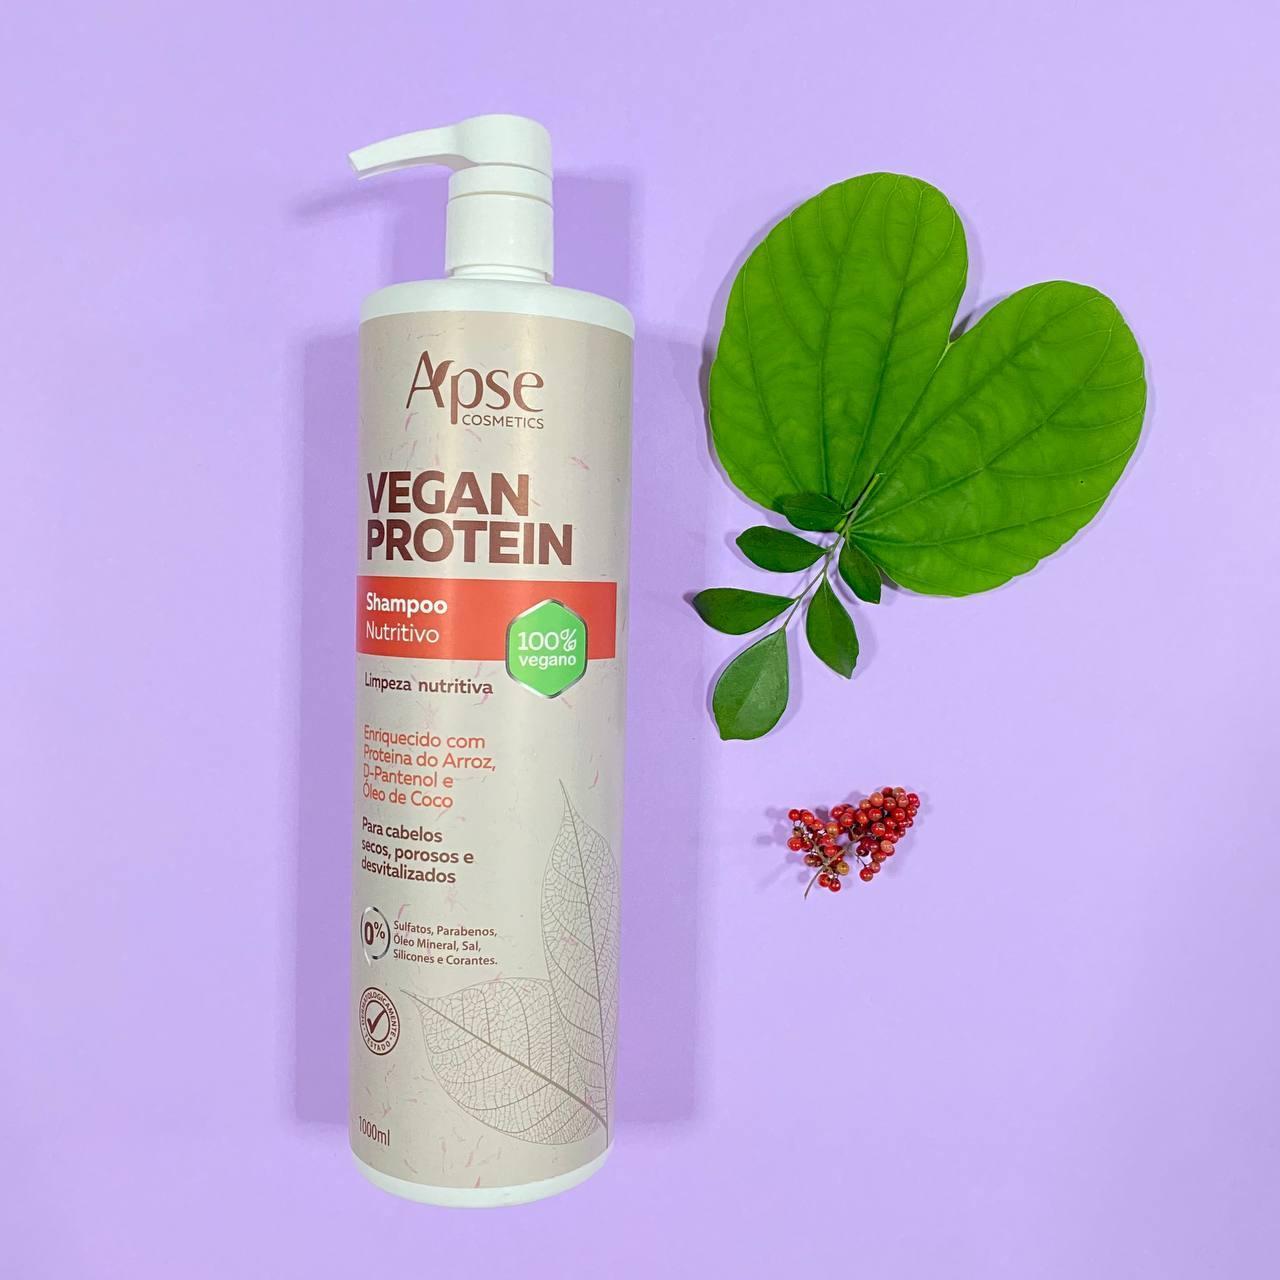 Shampoo Nutritivo Vegan Protein - Apse Cosmetics 1000ml